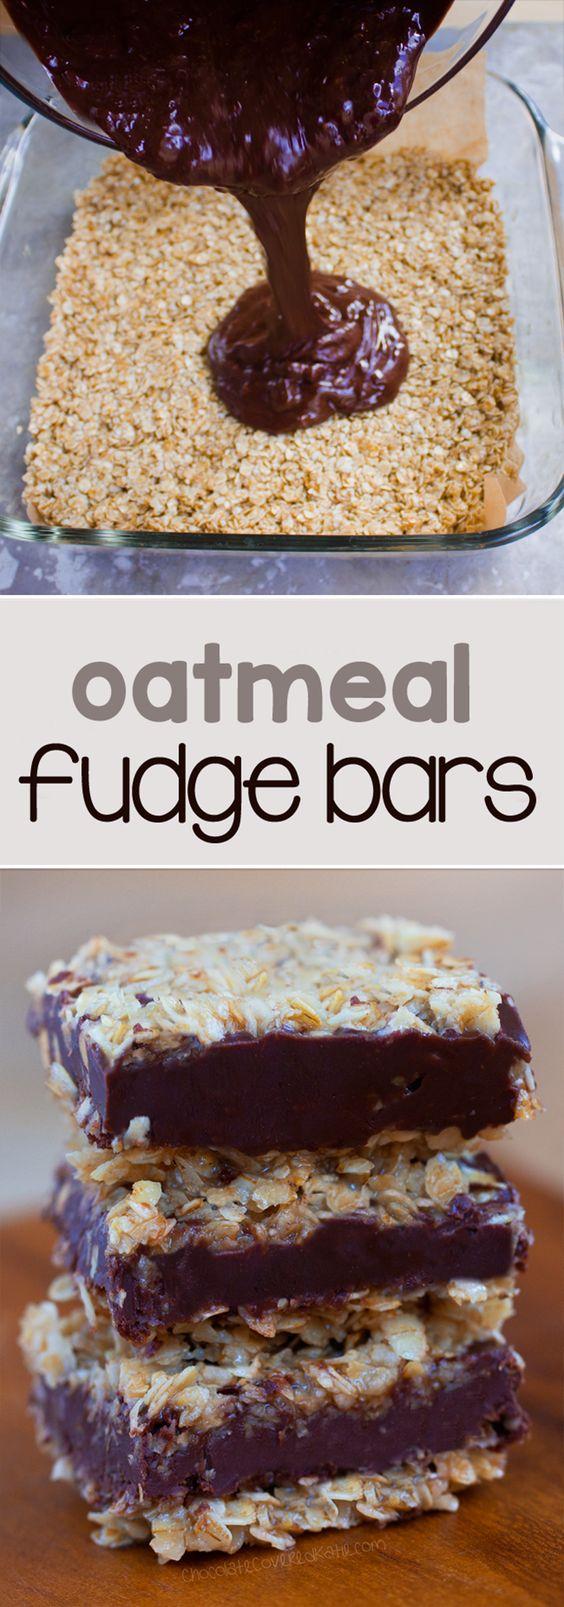 Oatmeal Fudge Bars - These gooey fudge bars are ADDICTIVE!